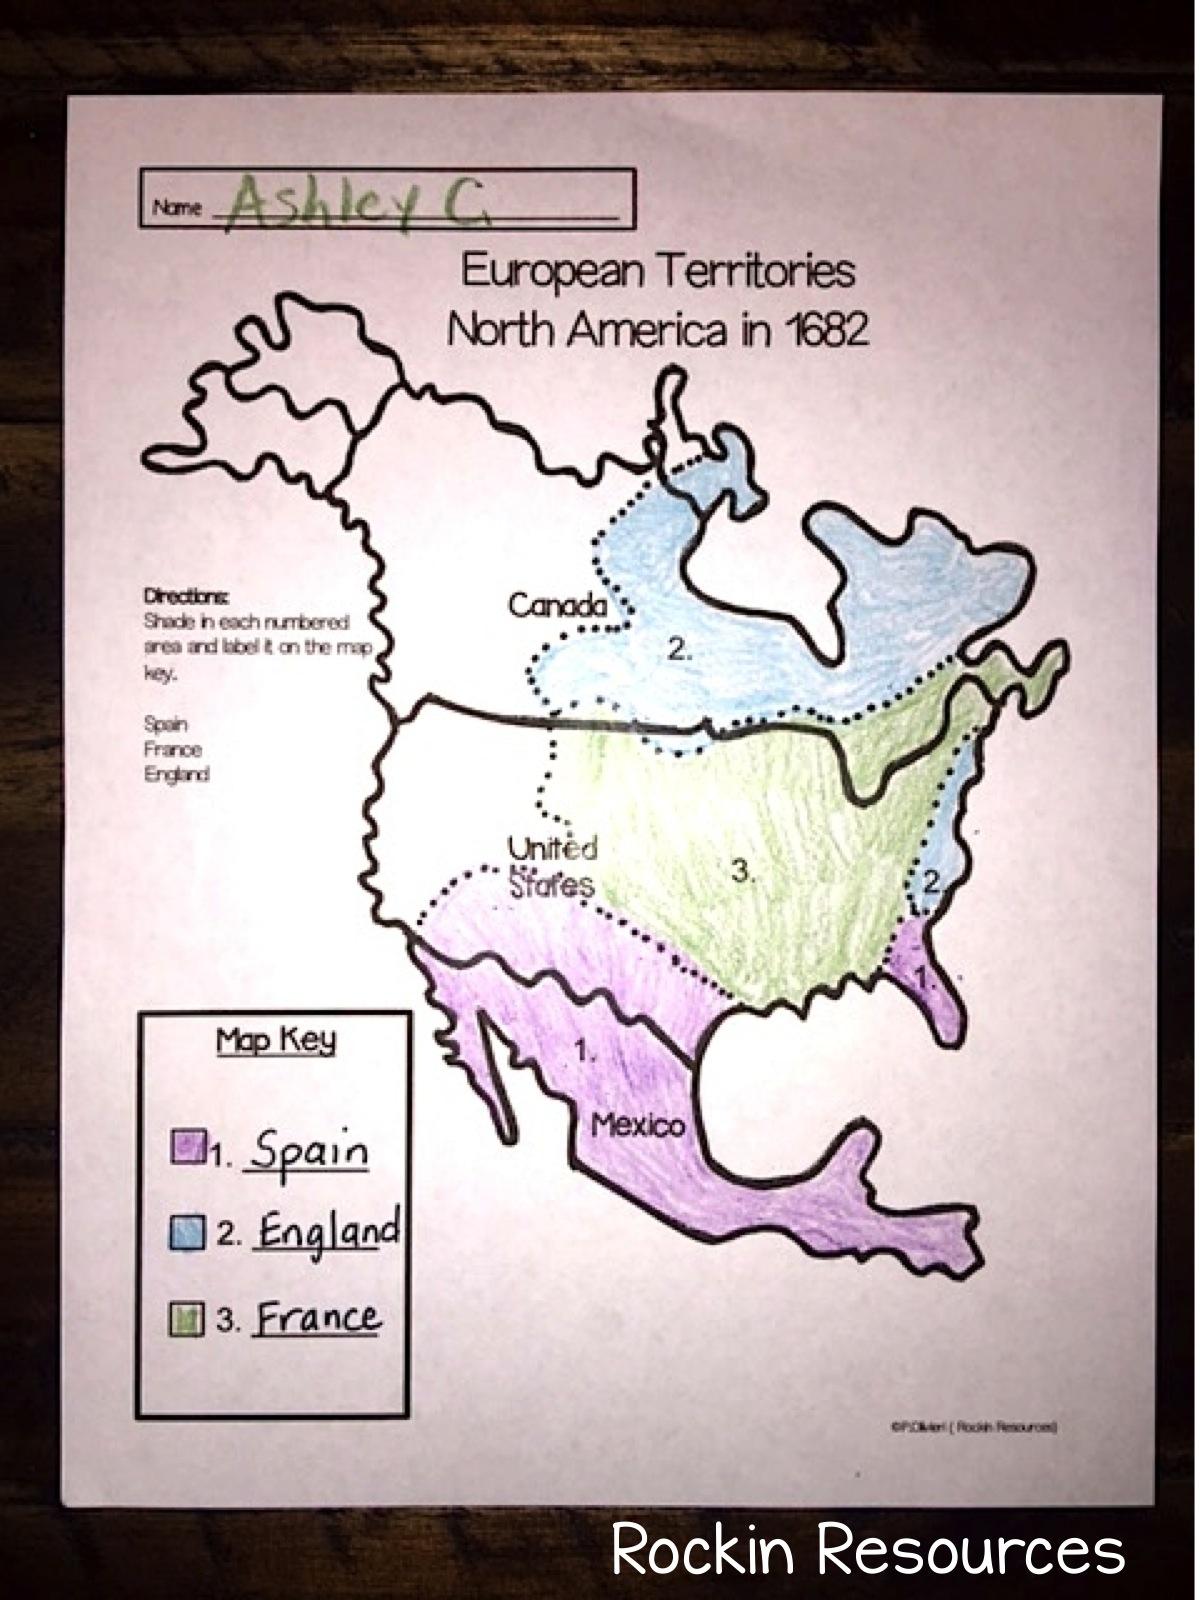 Columbian Exchange Diagram Block Of Digital Tachometer Teaching And European Settlements With